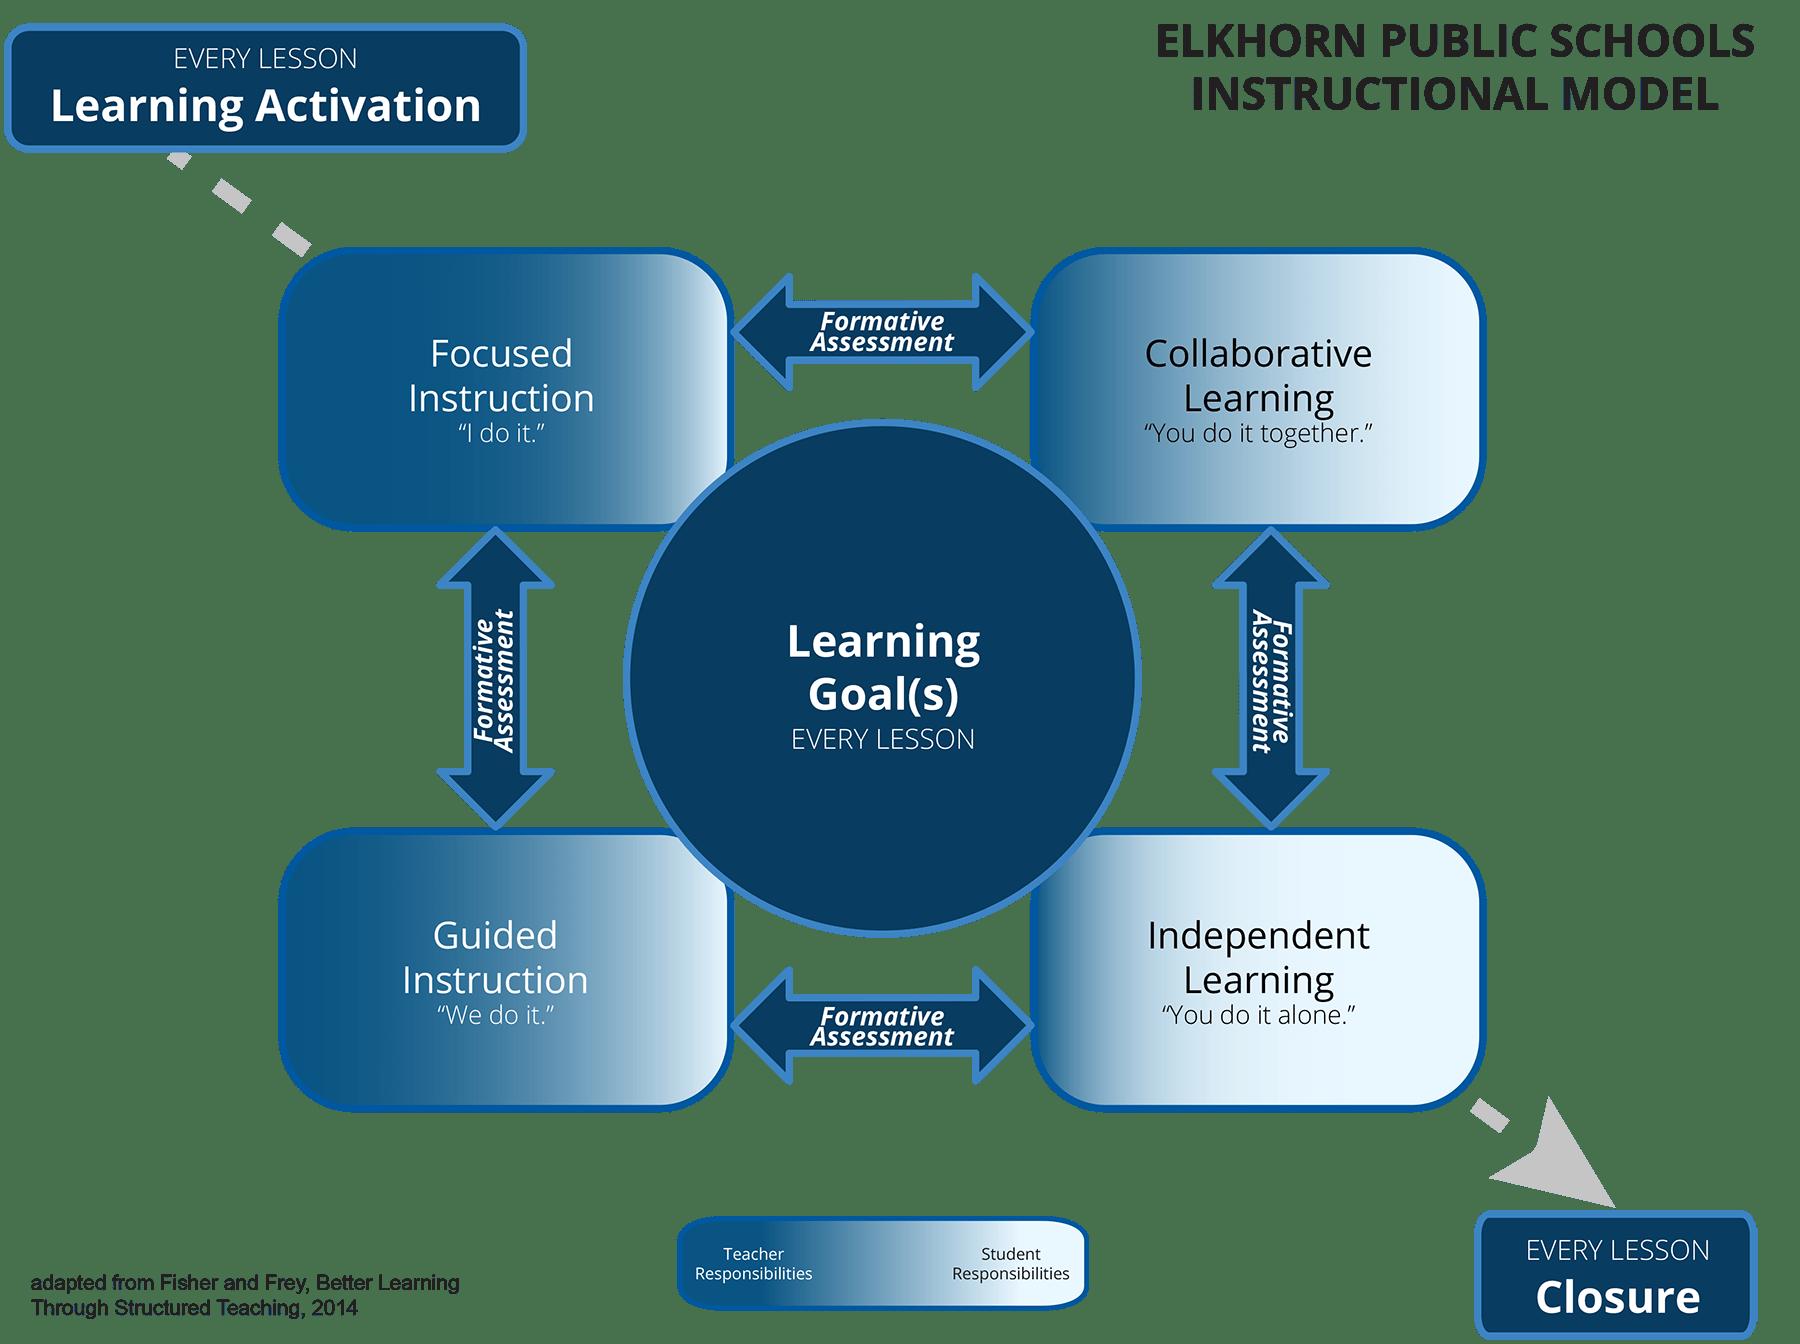 Elkhorn Instructional Model Visual 2